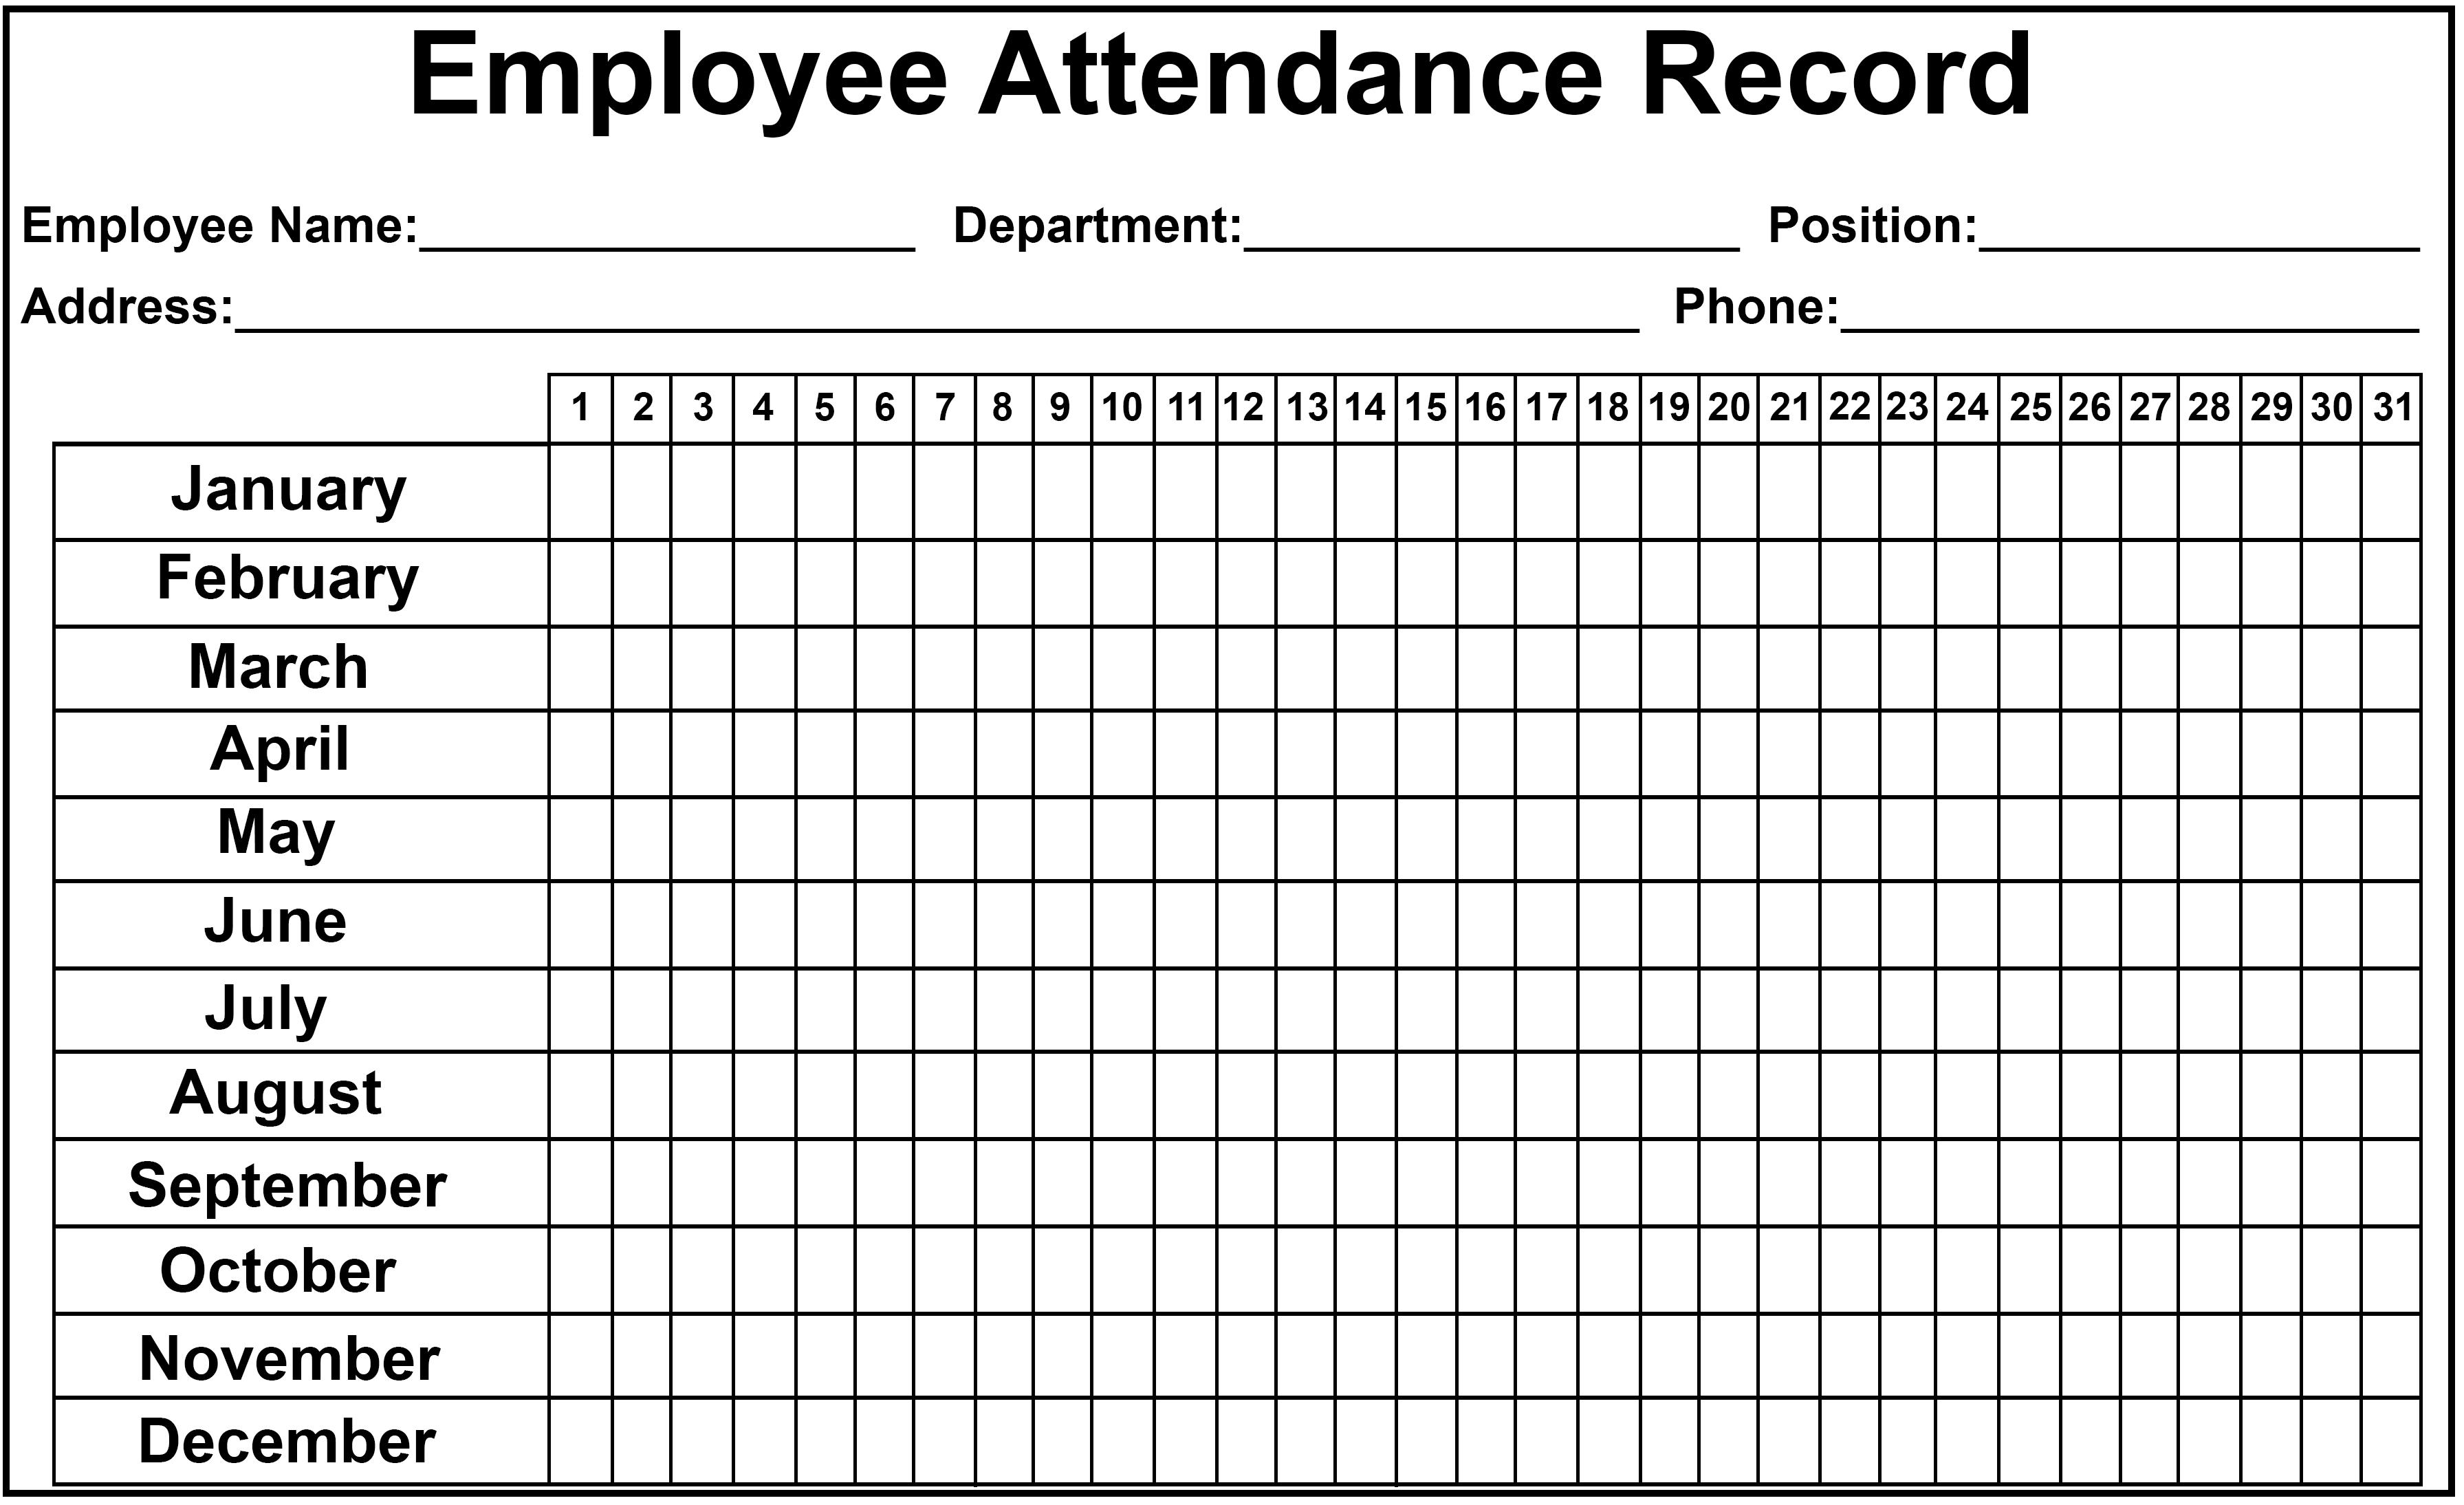 Employee Attendance Tracker Sheet 2019 | Printable Calendar Diy-2020 Employee Attendance Calendar Record Template Free